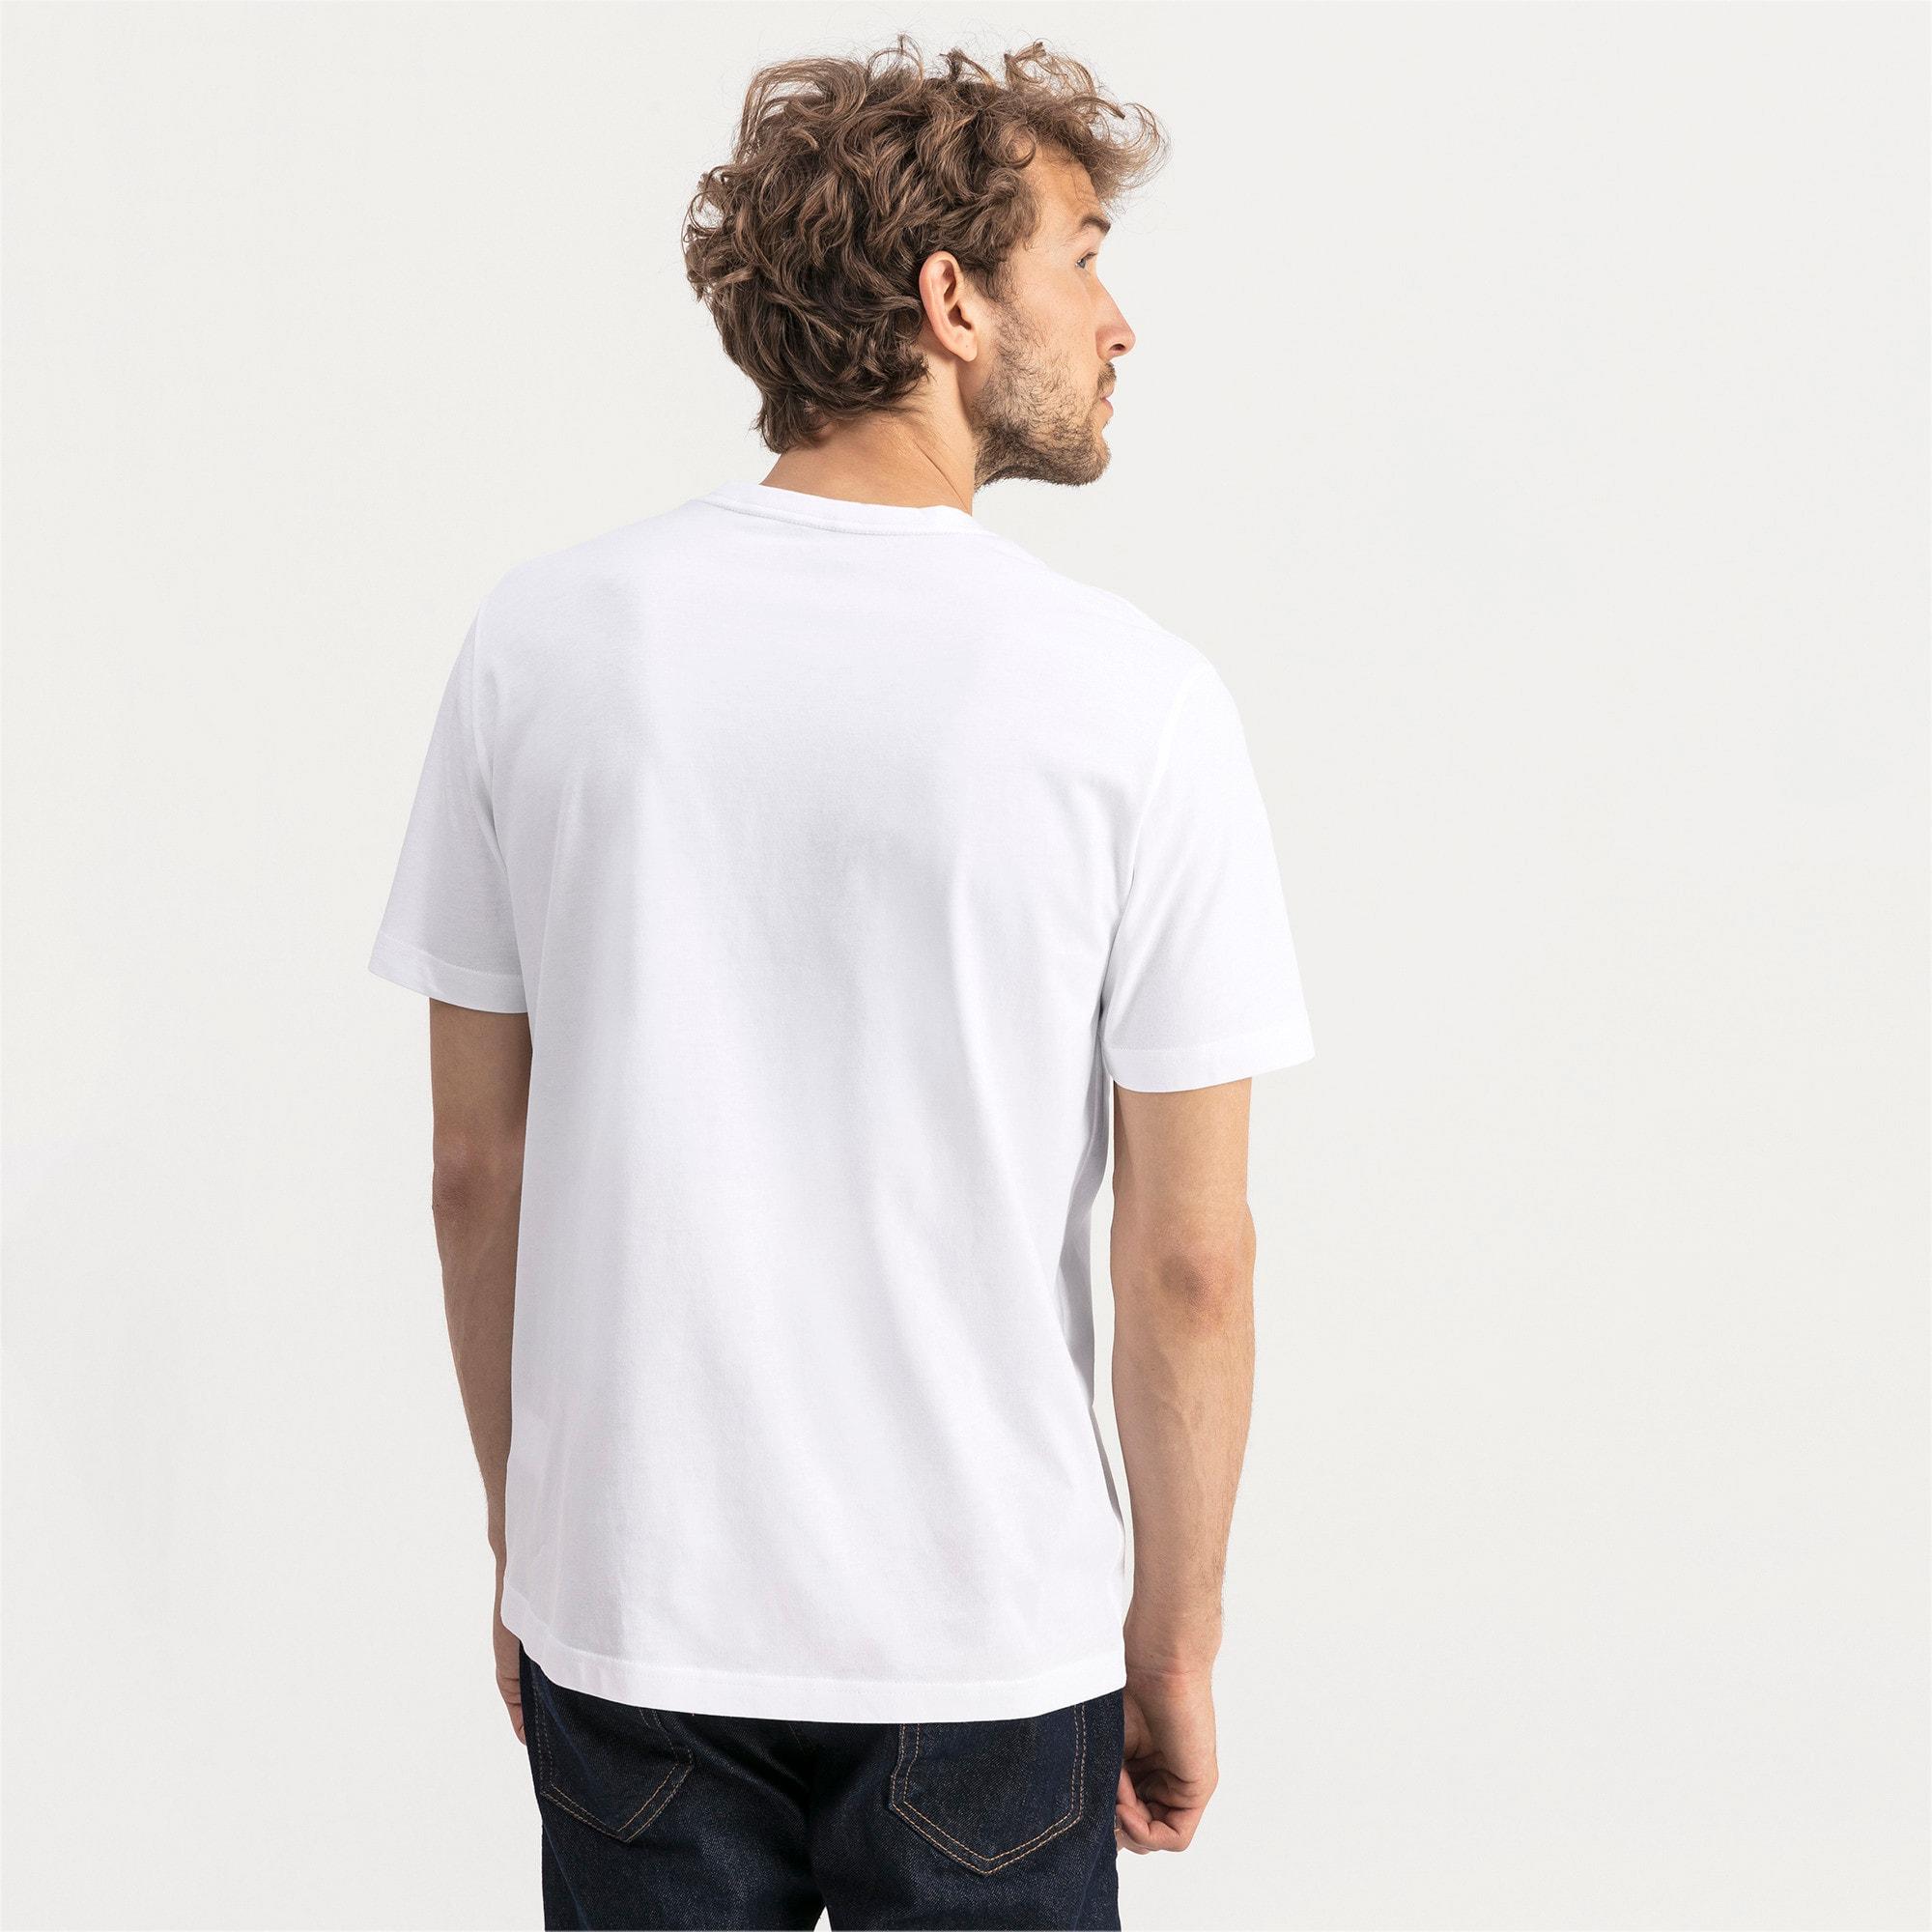 Thumbnail 2 of T-shirt con scollo a V Essentials uomo, Puma White, medium